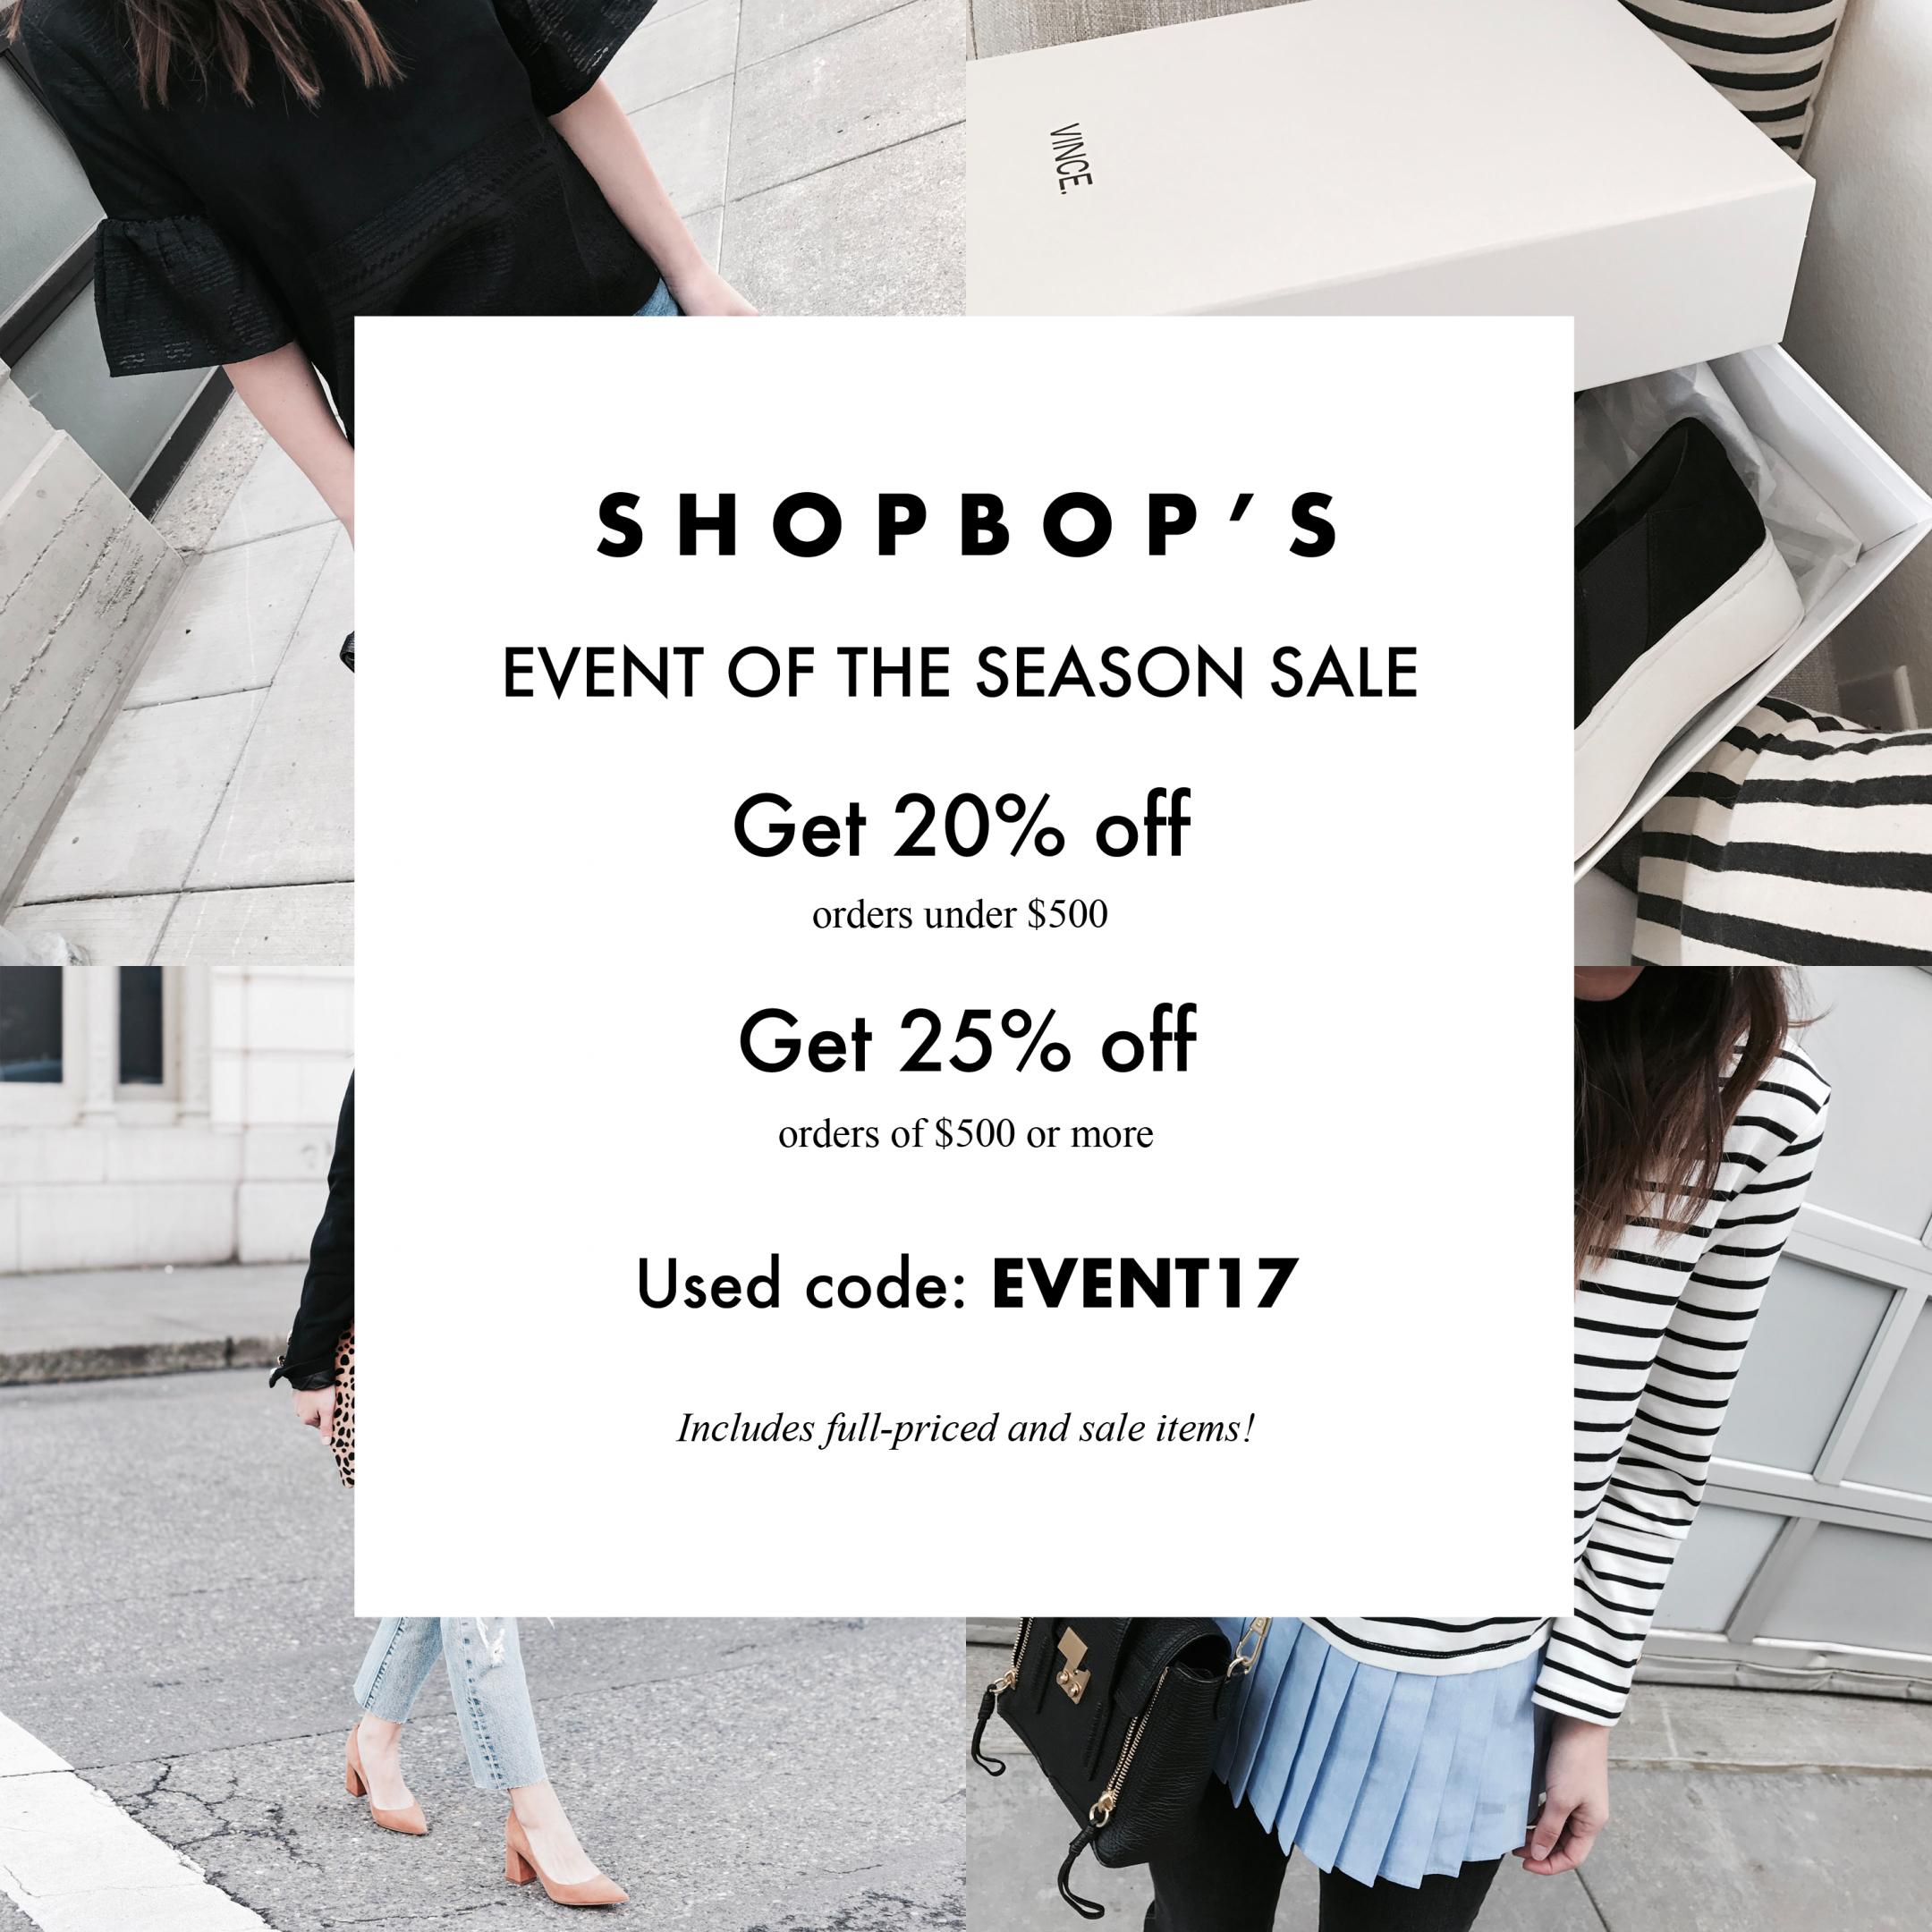 Shopbop's event of season sale